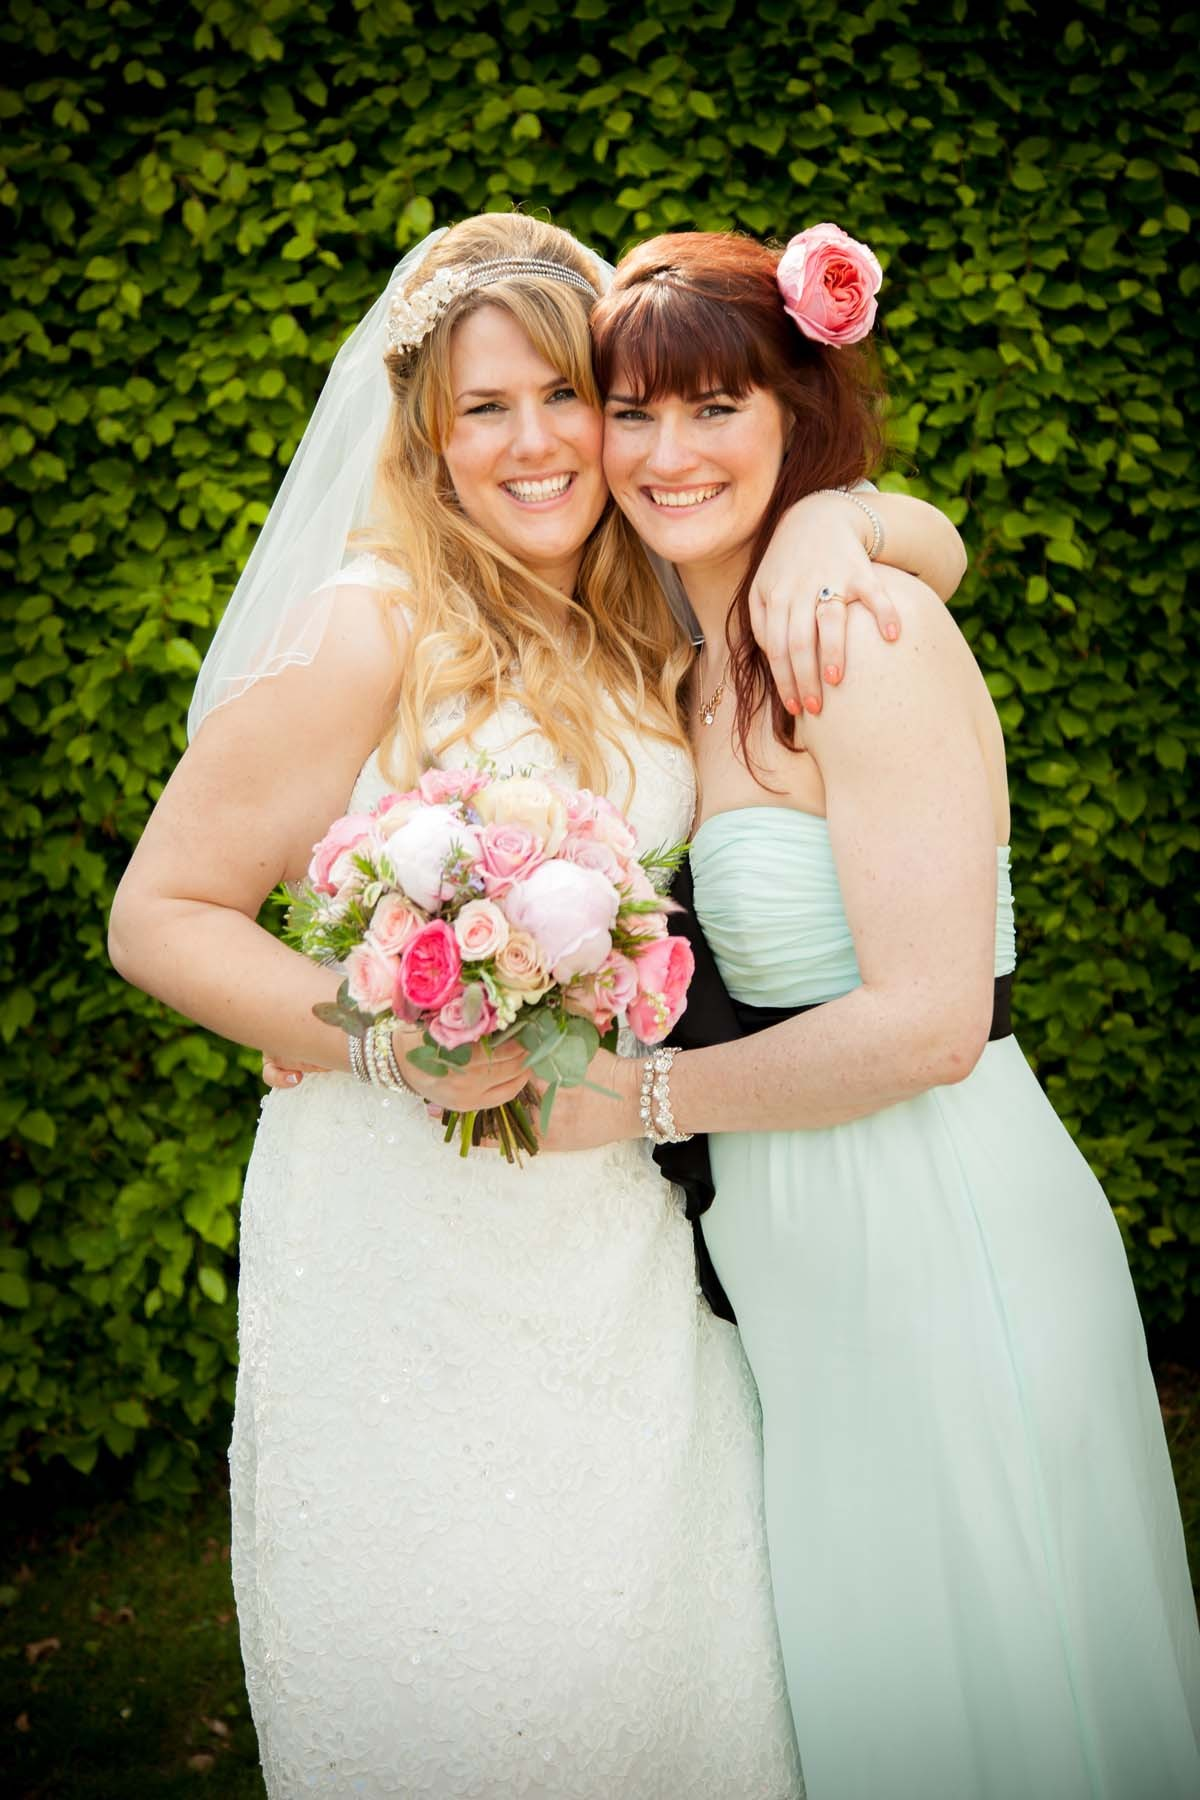 Sussex & Surrey Wedding Photographer - Guests & Groups (10)